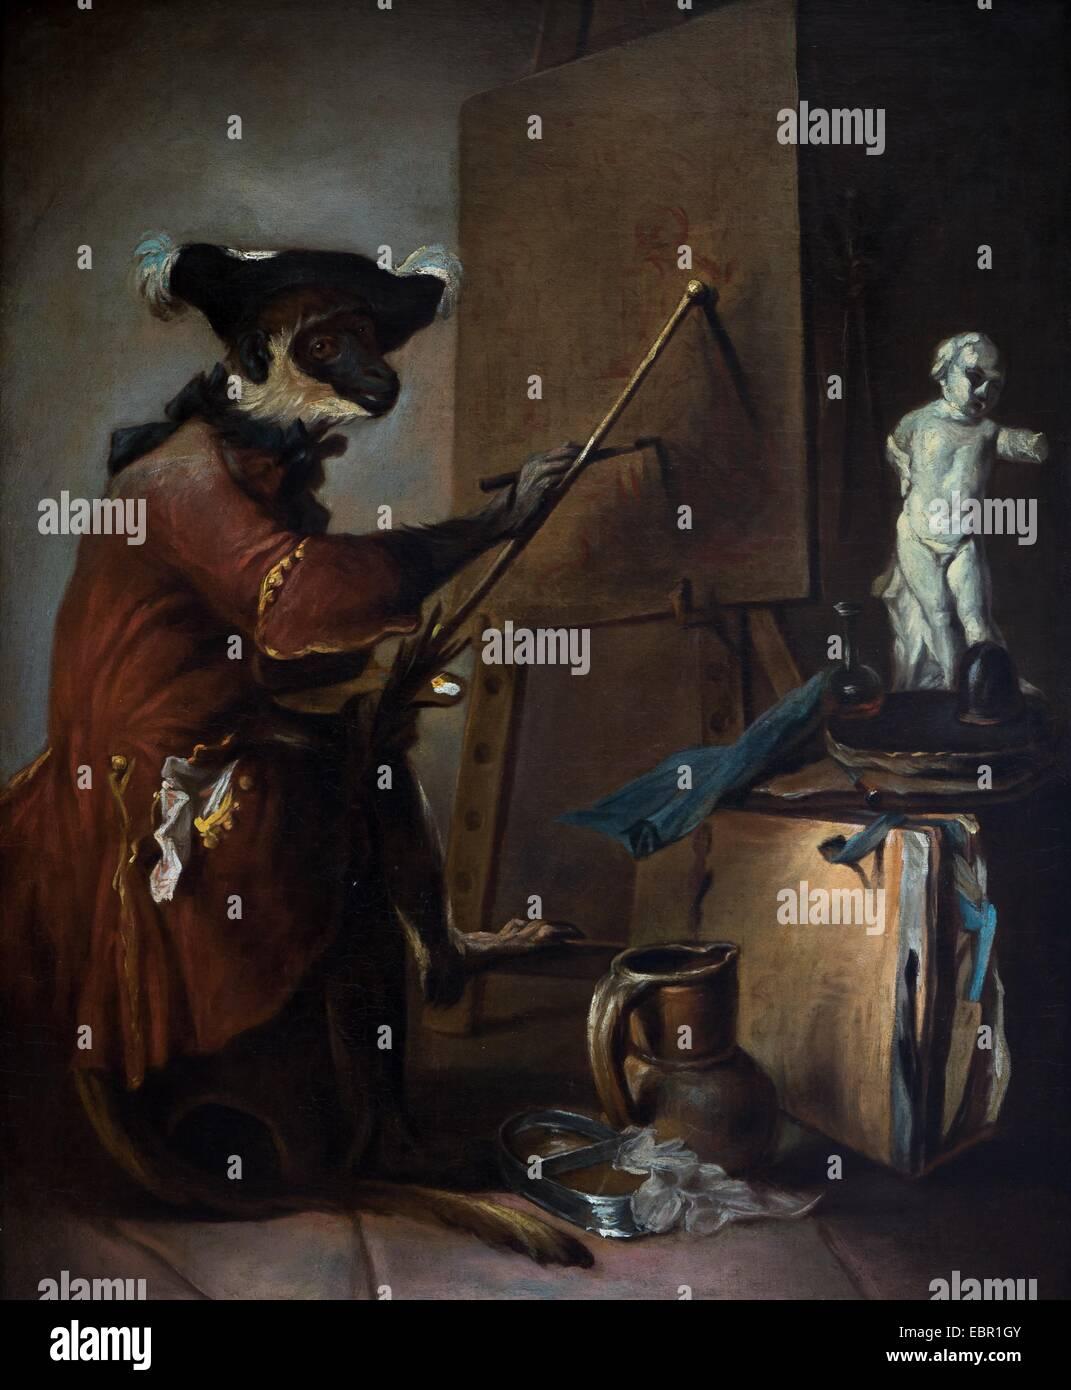 ActiveMuseum_0001872.jpg / The Monkey Painter, circa 1740 - Jean-Simeon Chardin Oil on canvas 25/09/2013  -   / - Stock Image